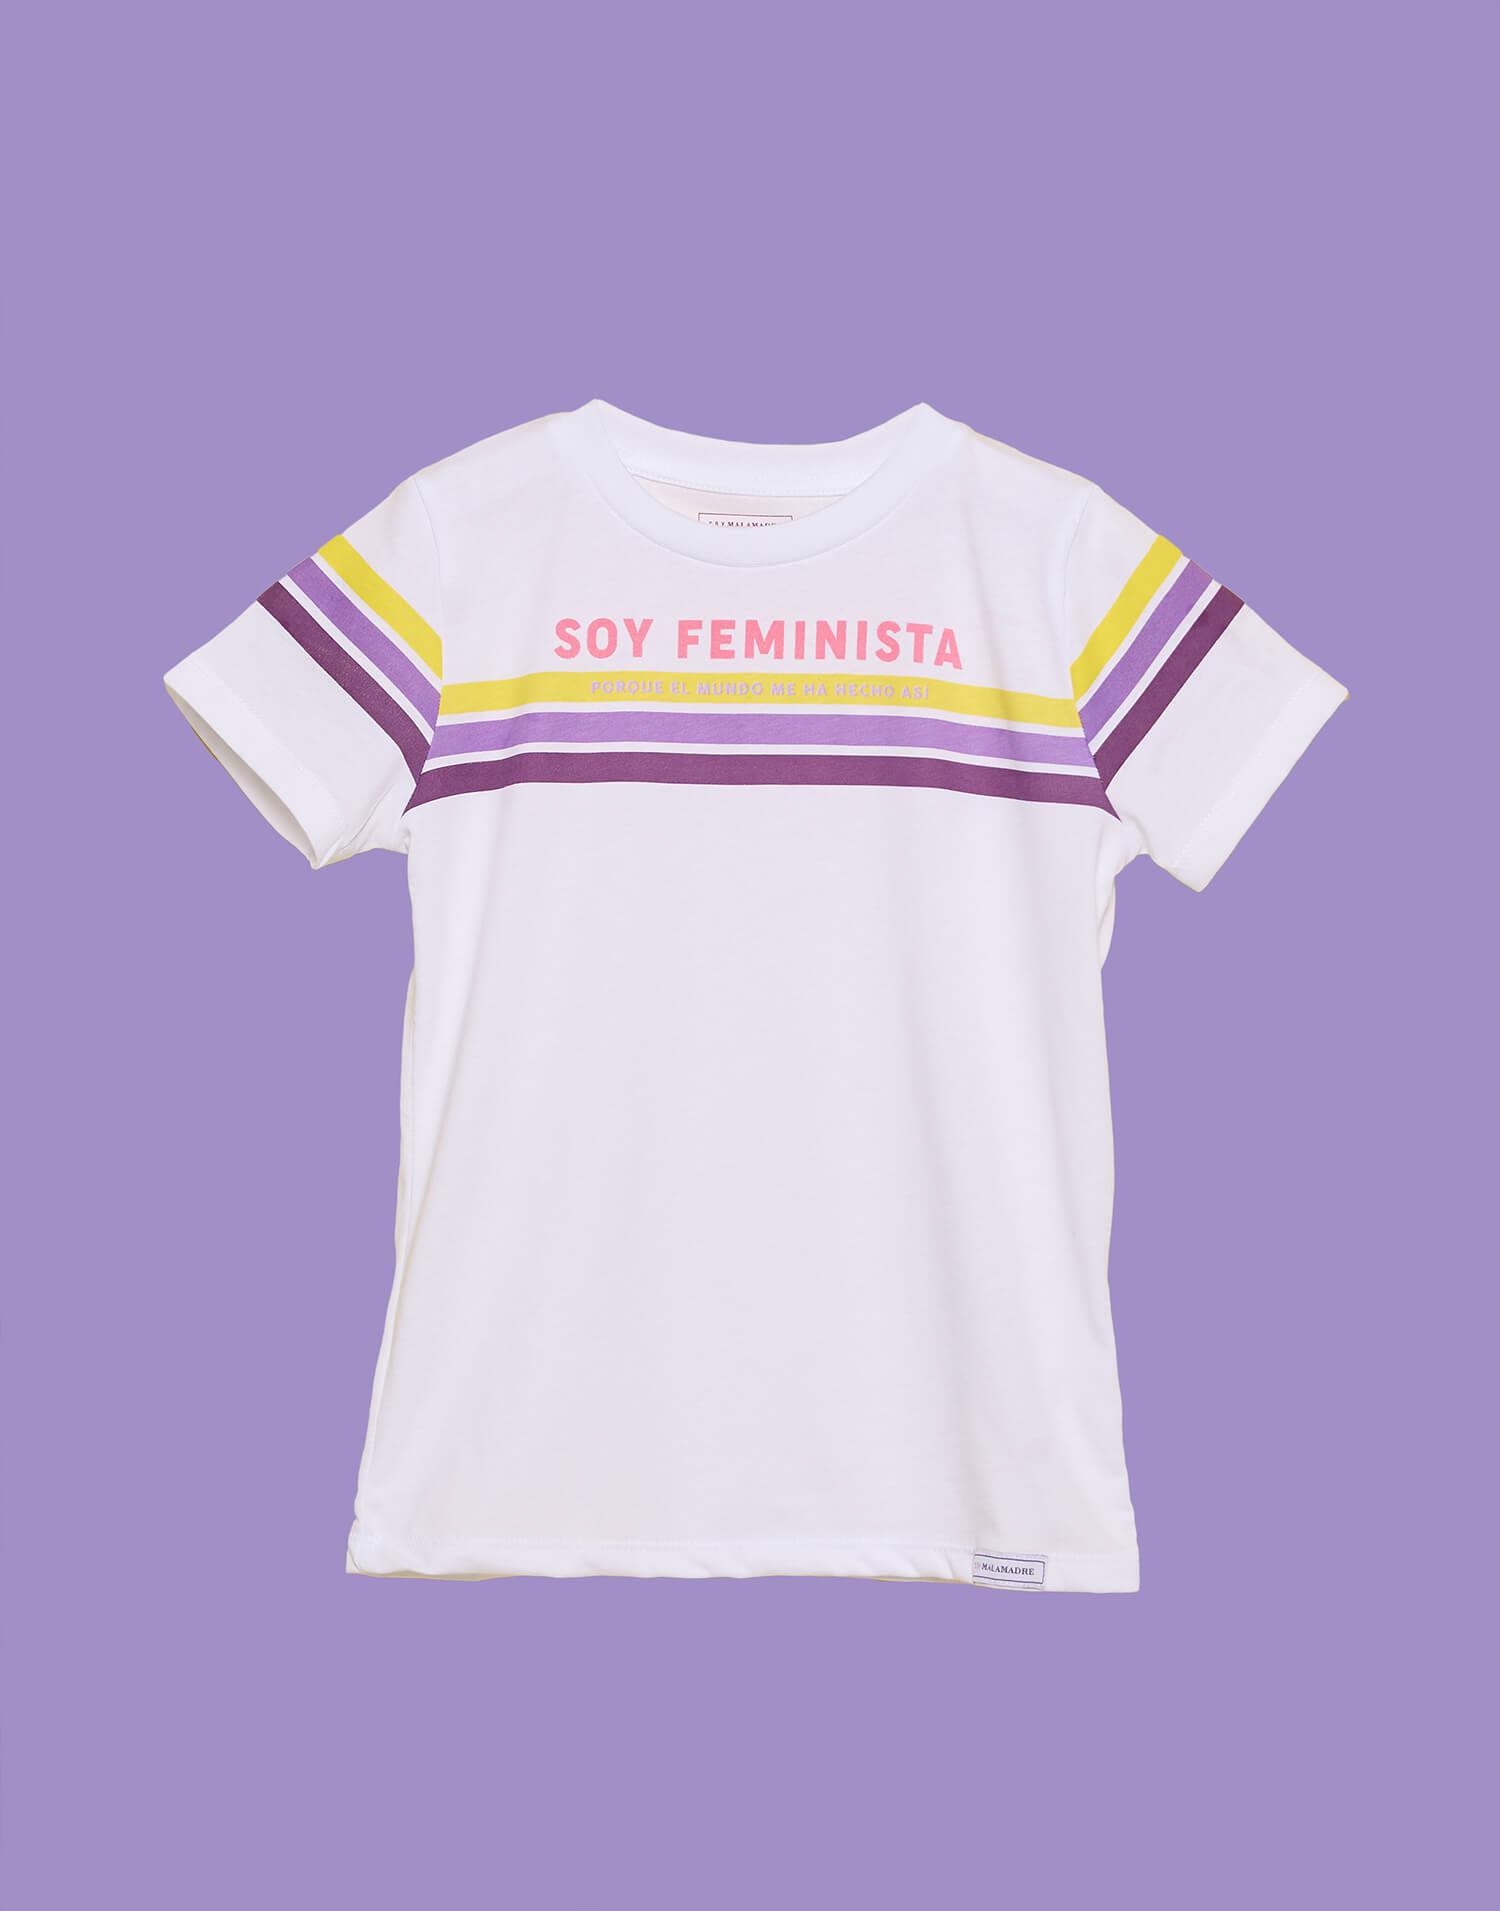 Camiseta niño 'Soy feminista'